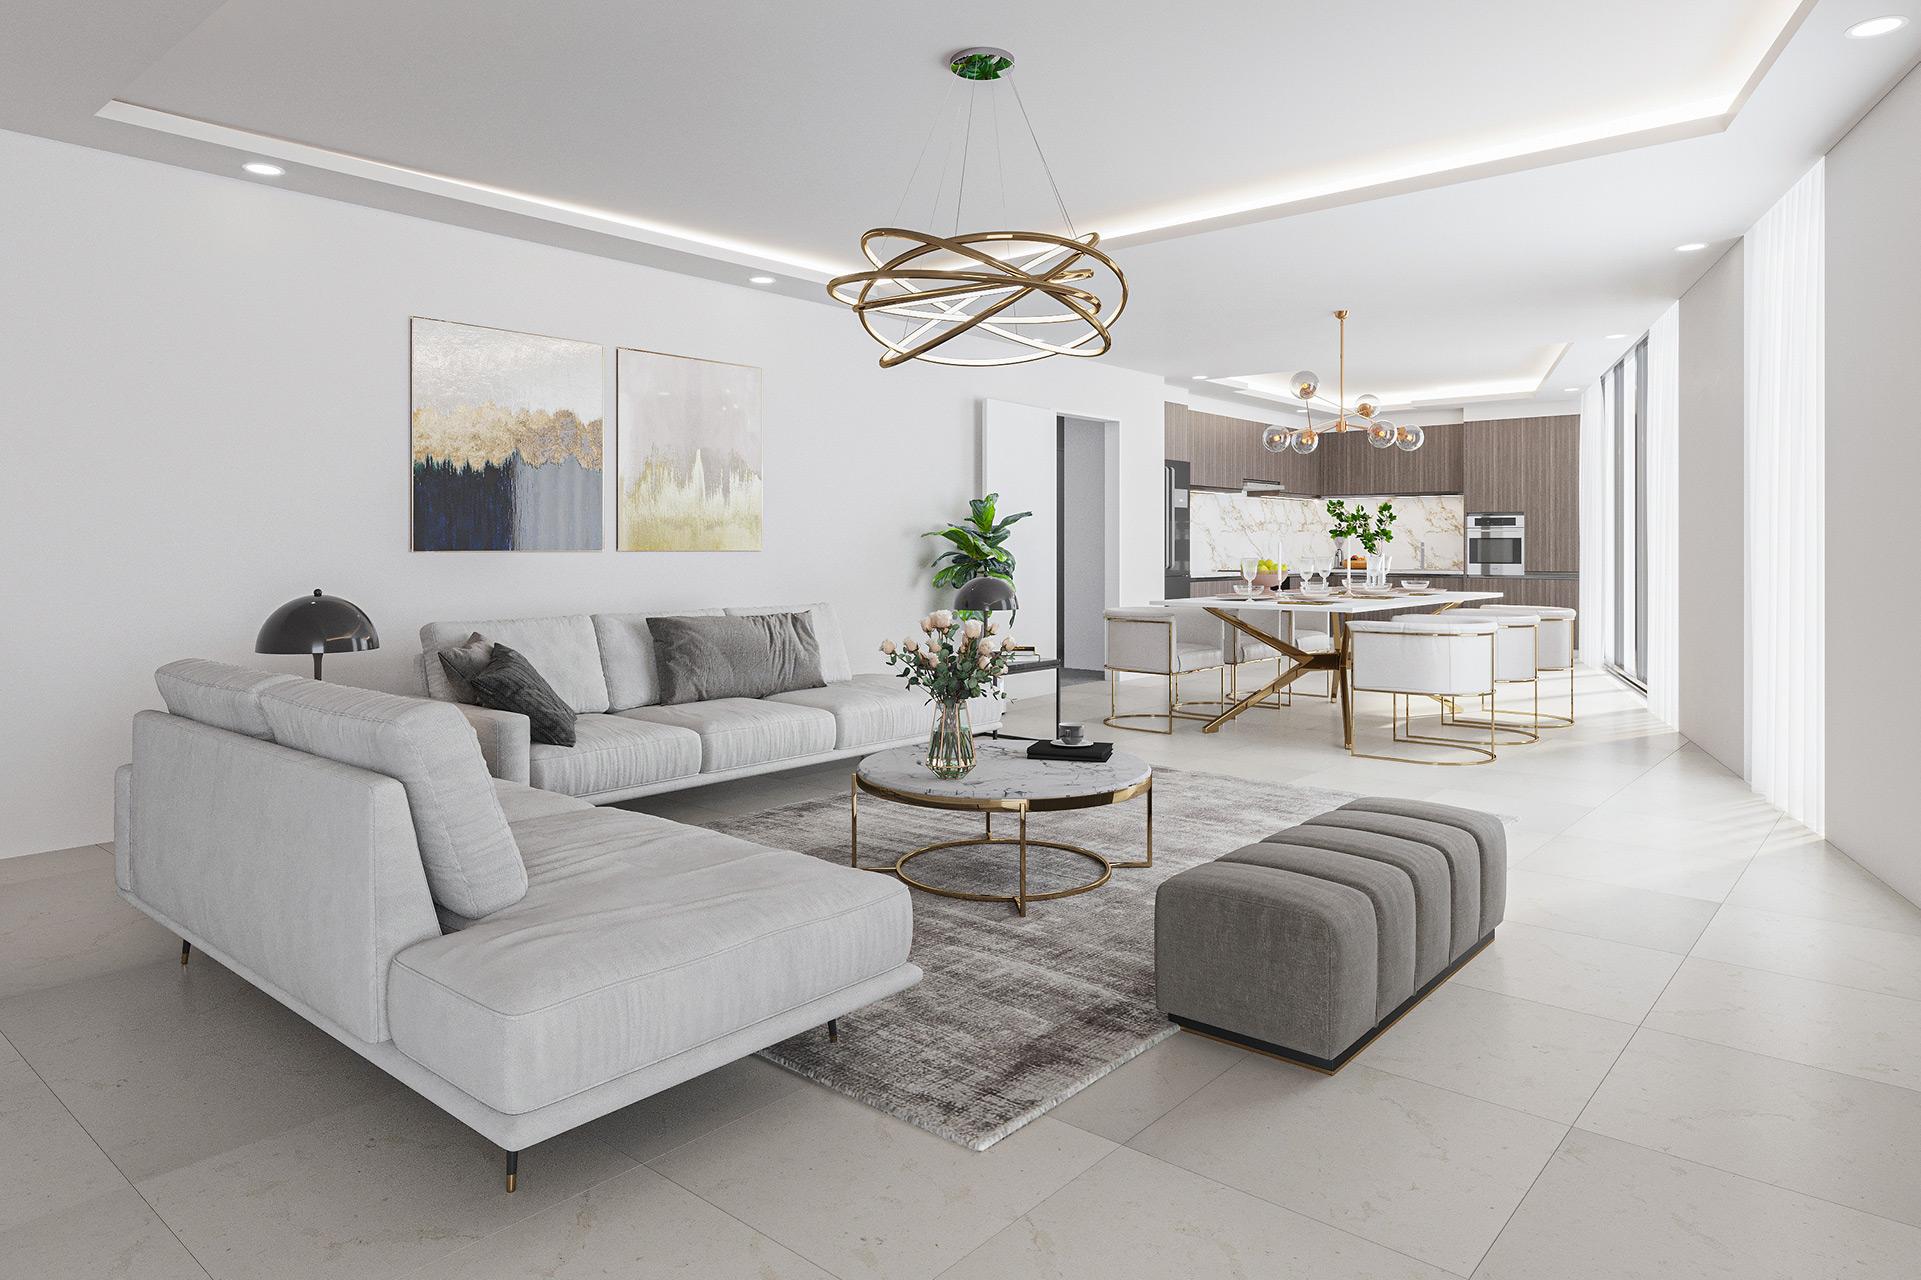 Interior Penthouse Rendering